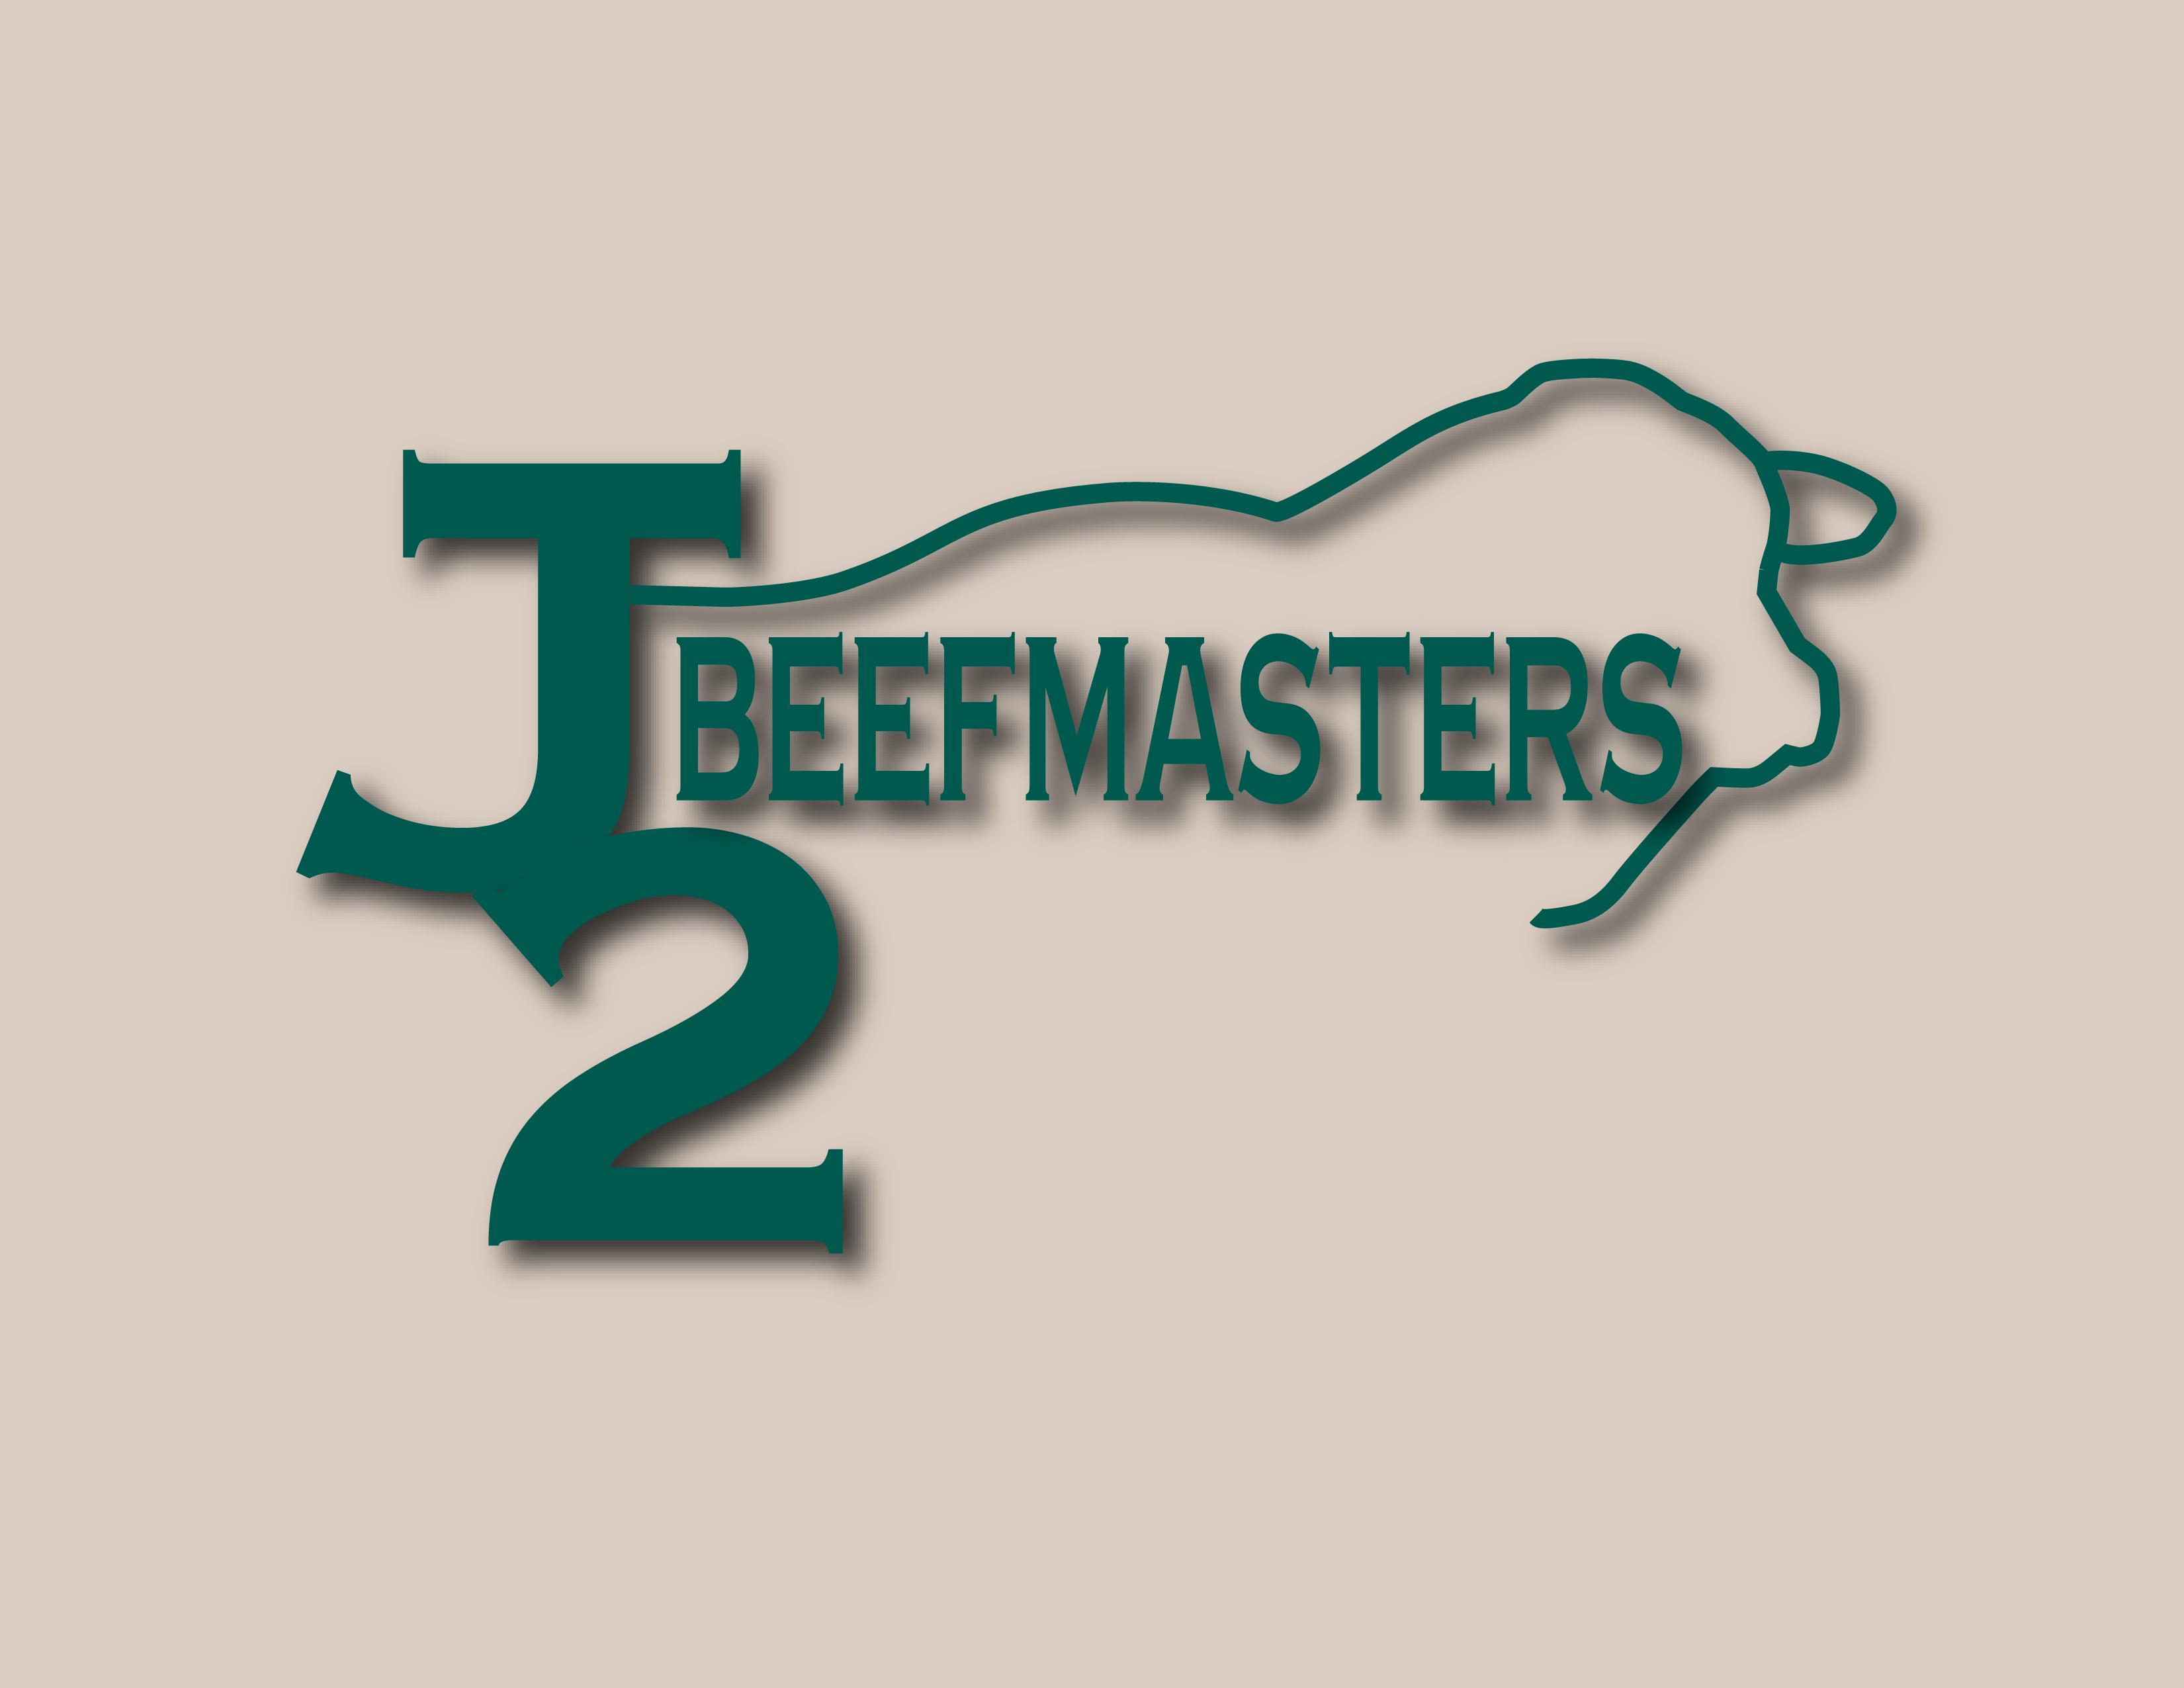 J2 Beefmasters